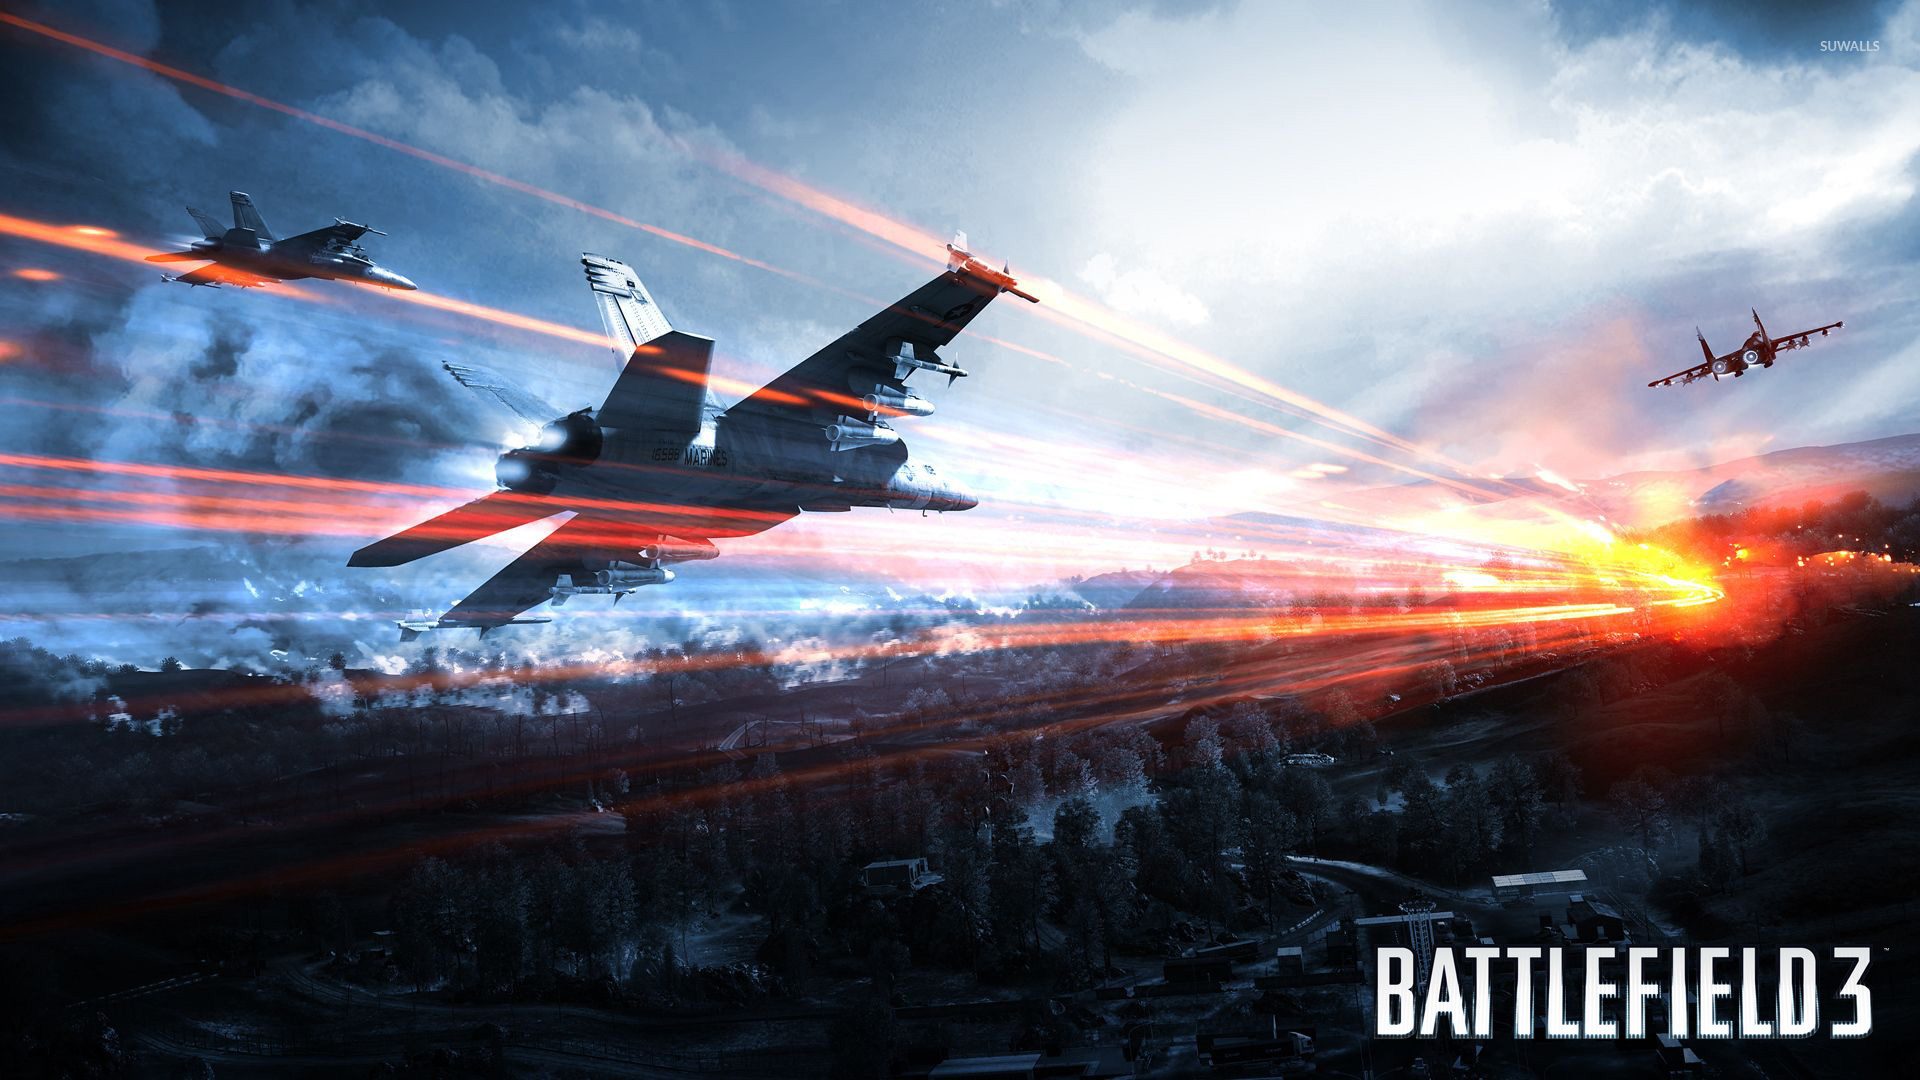 Battlefield 3 wallpaper - Game wallpapers - #8548